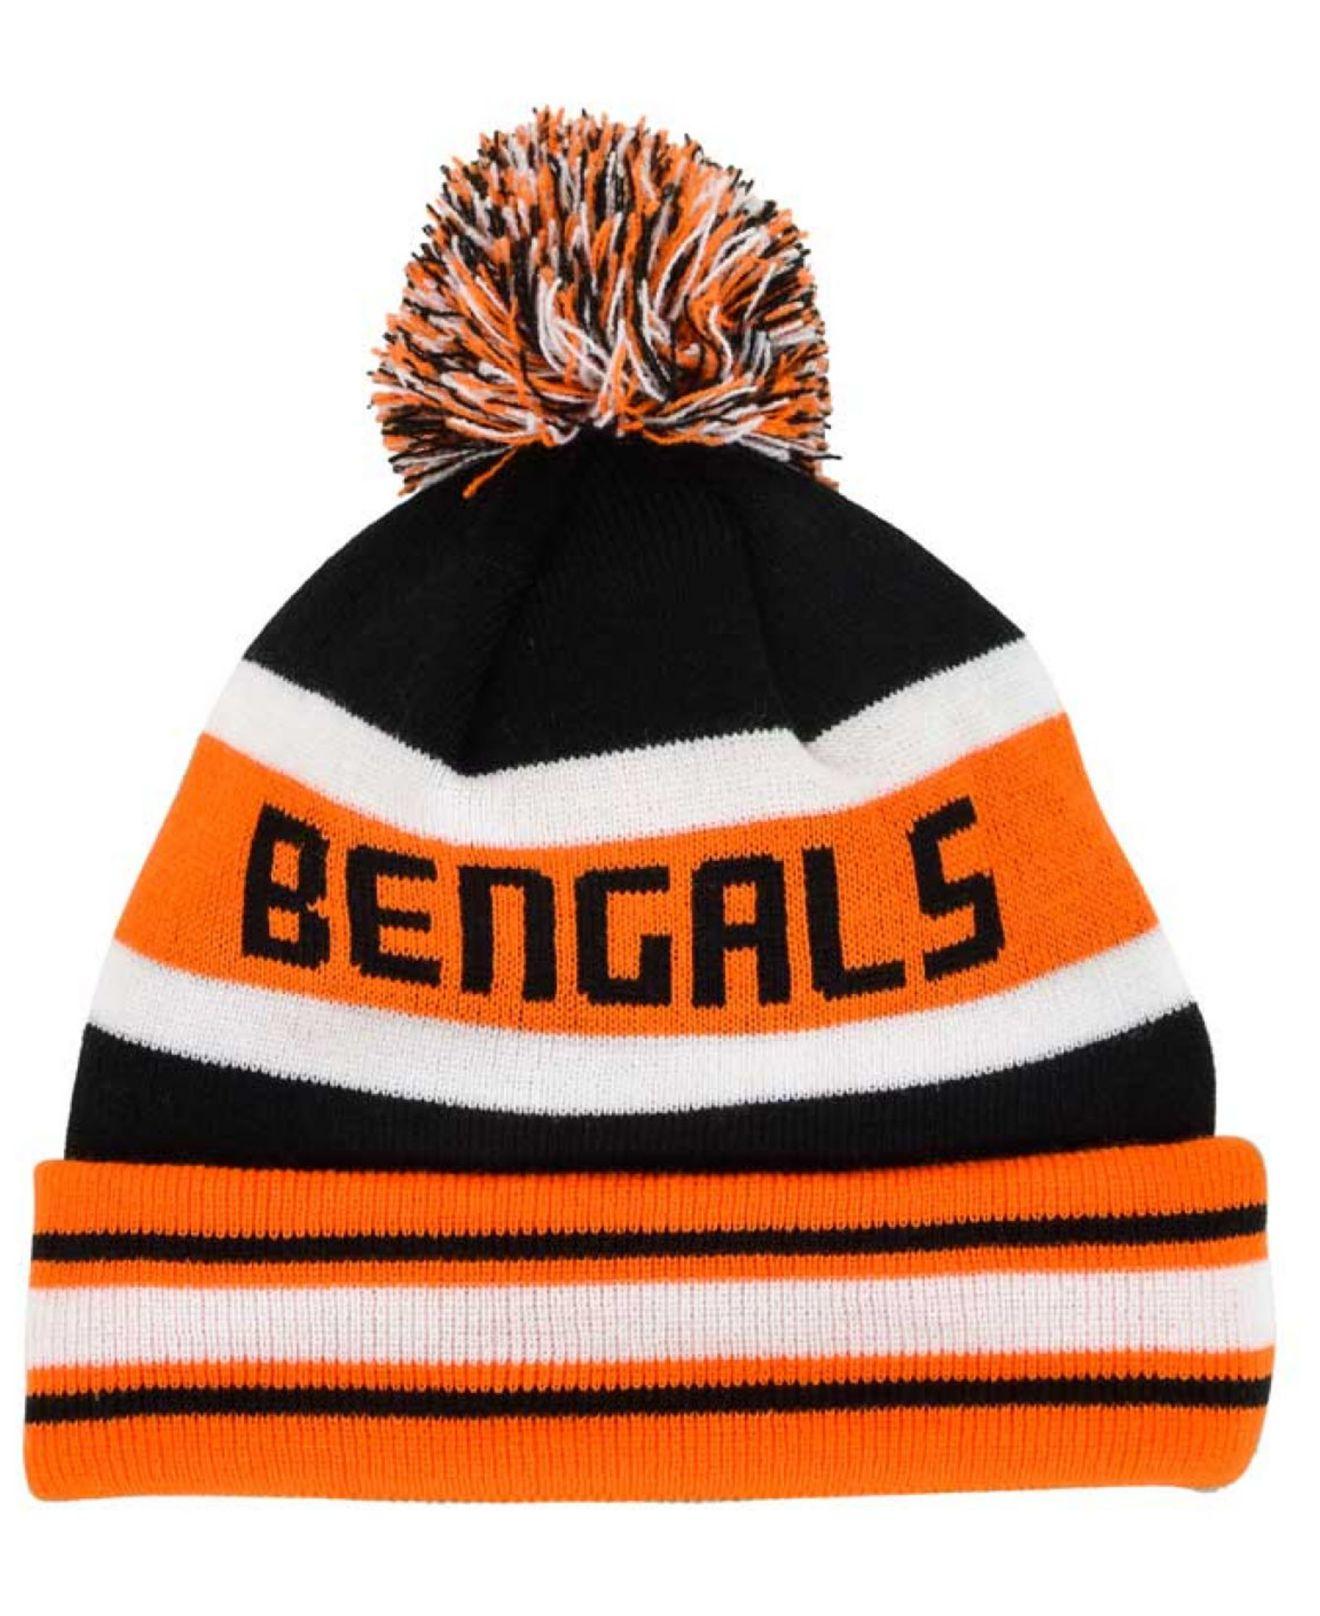 Lyst - KTZ Cincinnati Bengals Team Color Black Jake Knit Hat in ... 4912378c7